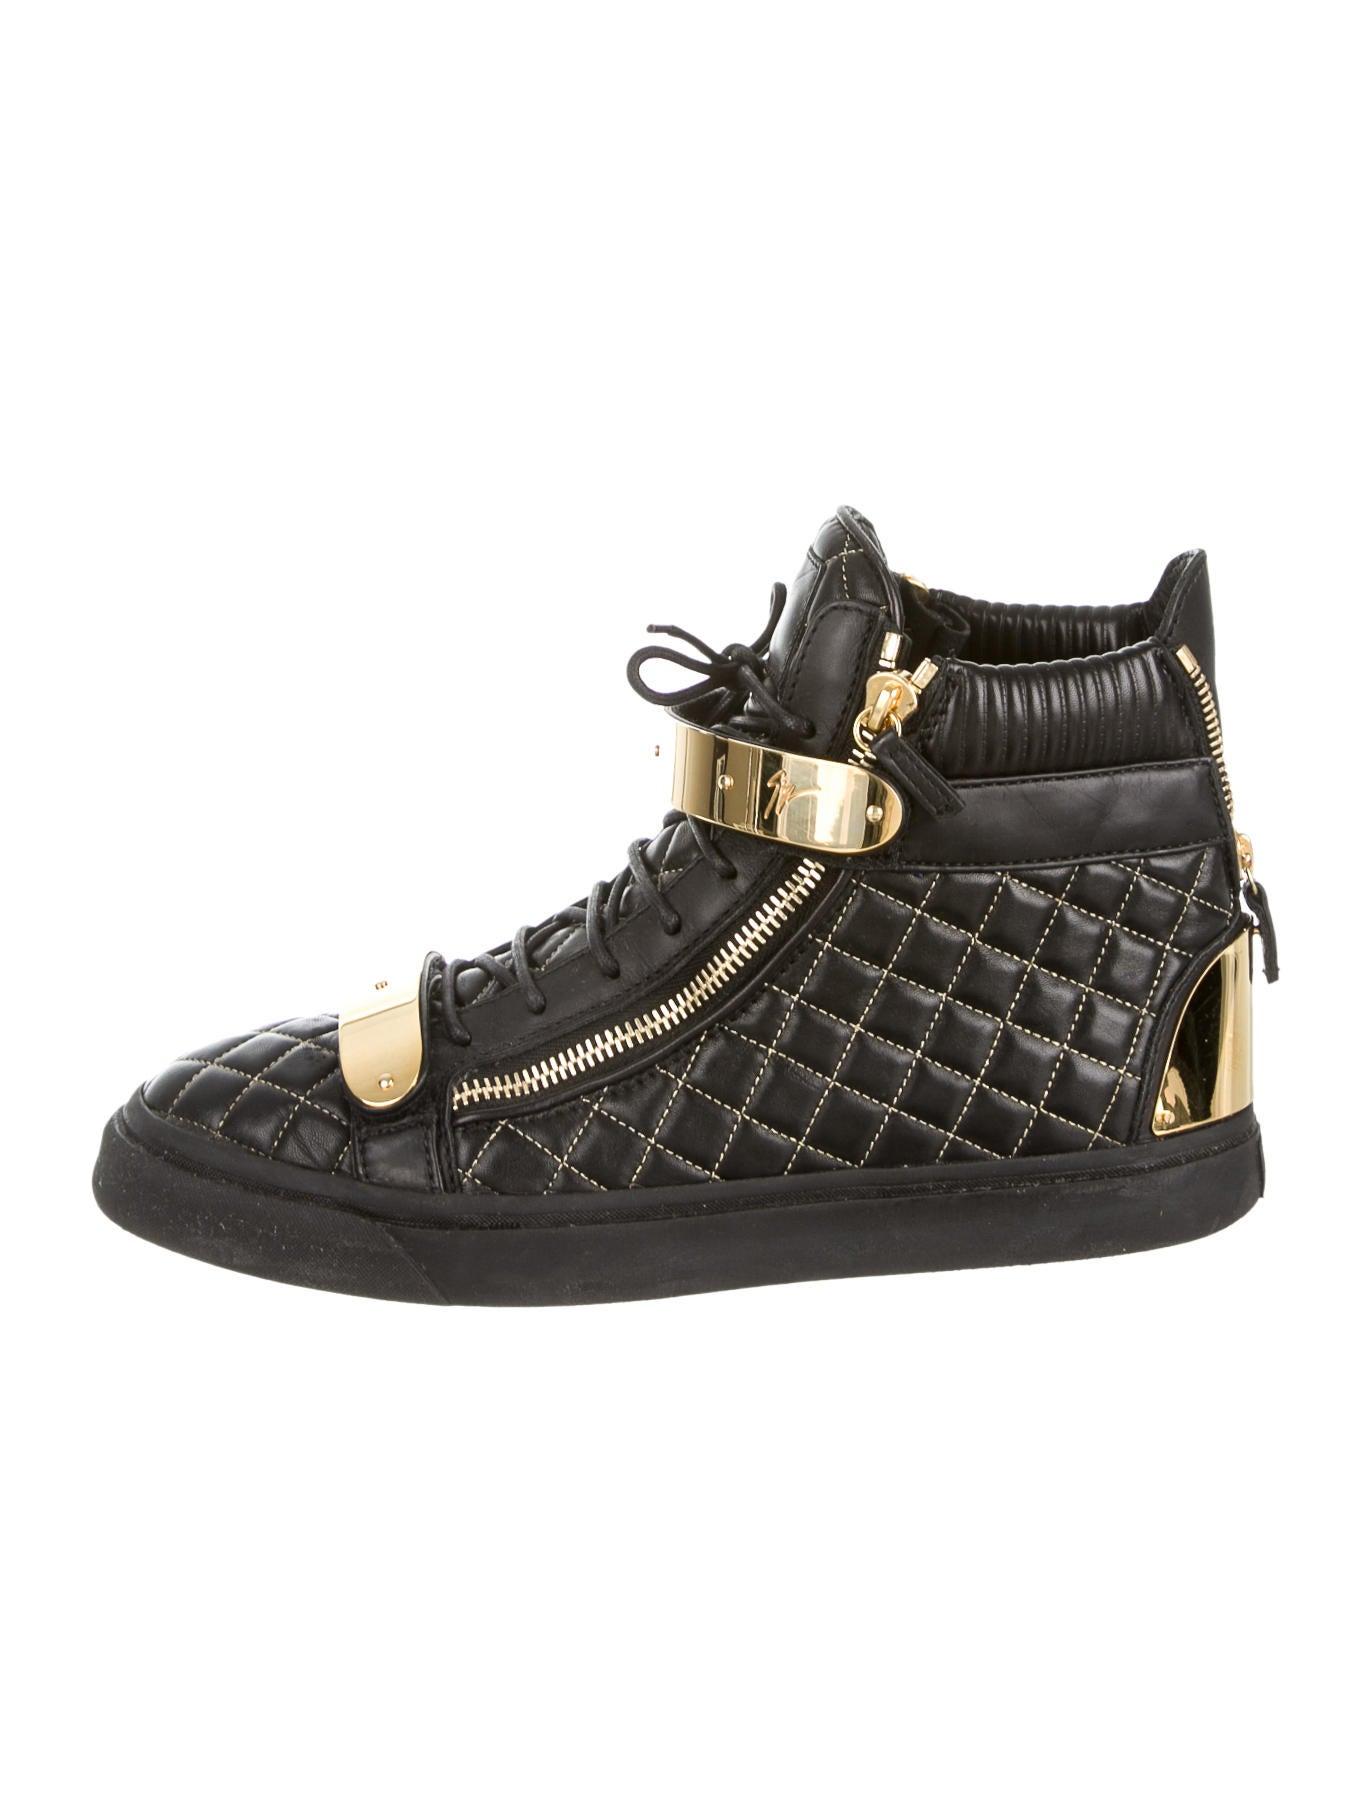 giuseppe zanotti high top sneakers mens shoes giu26496